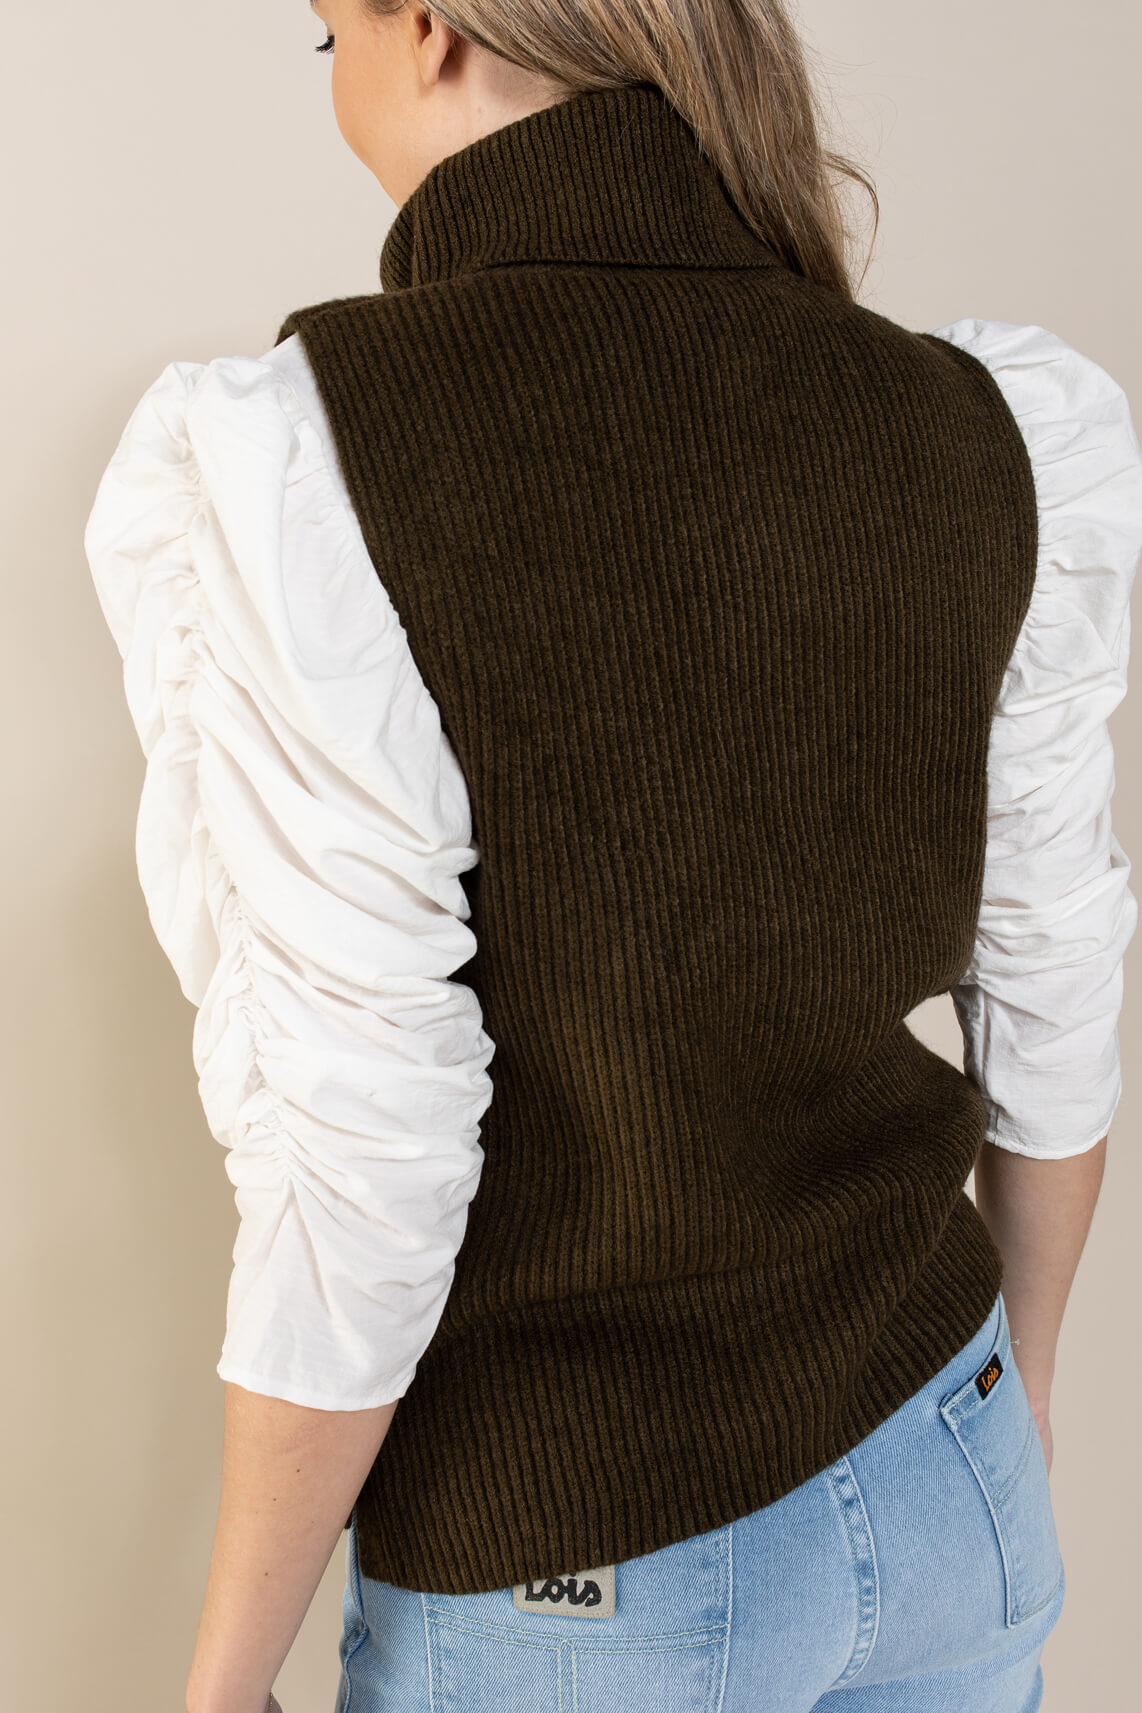 Co Couture Dames Button spencer Groen